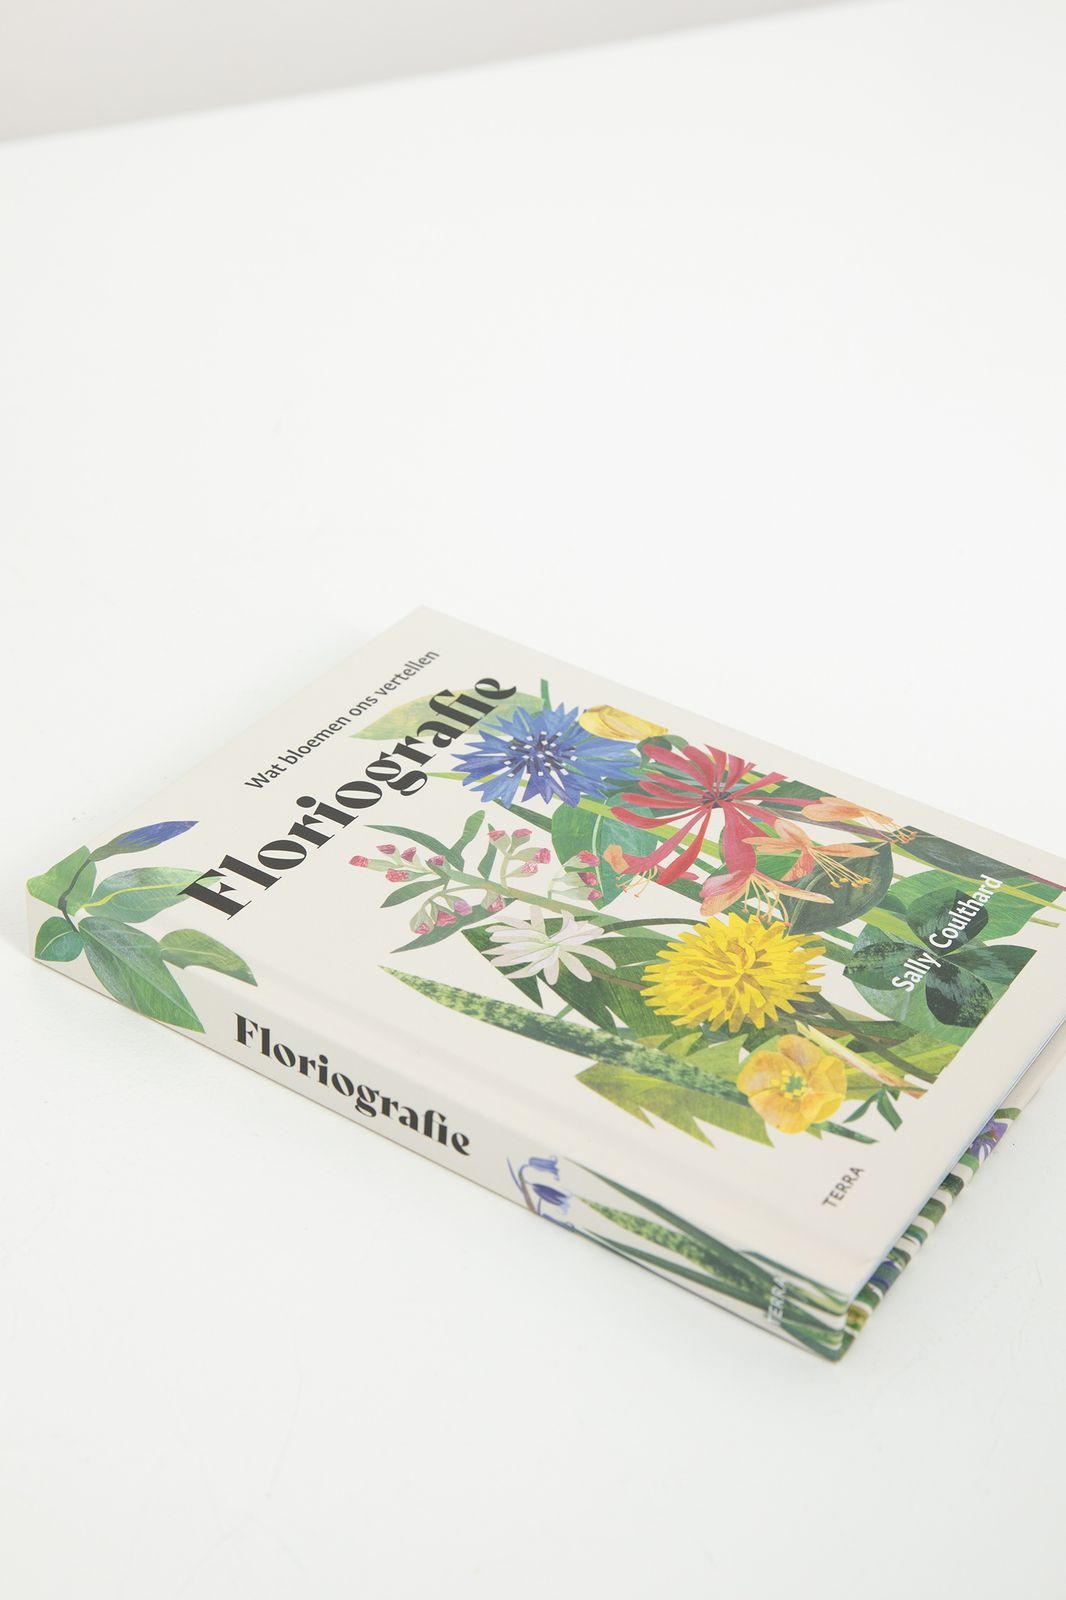 Boek Floriografie - Homeland | Sissy-Boy